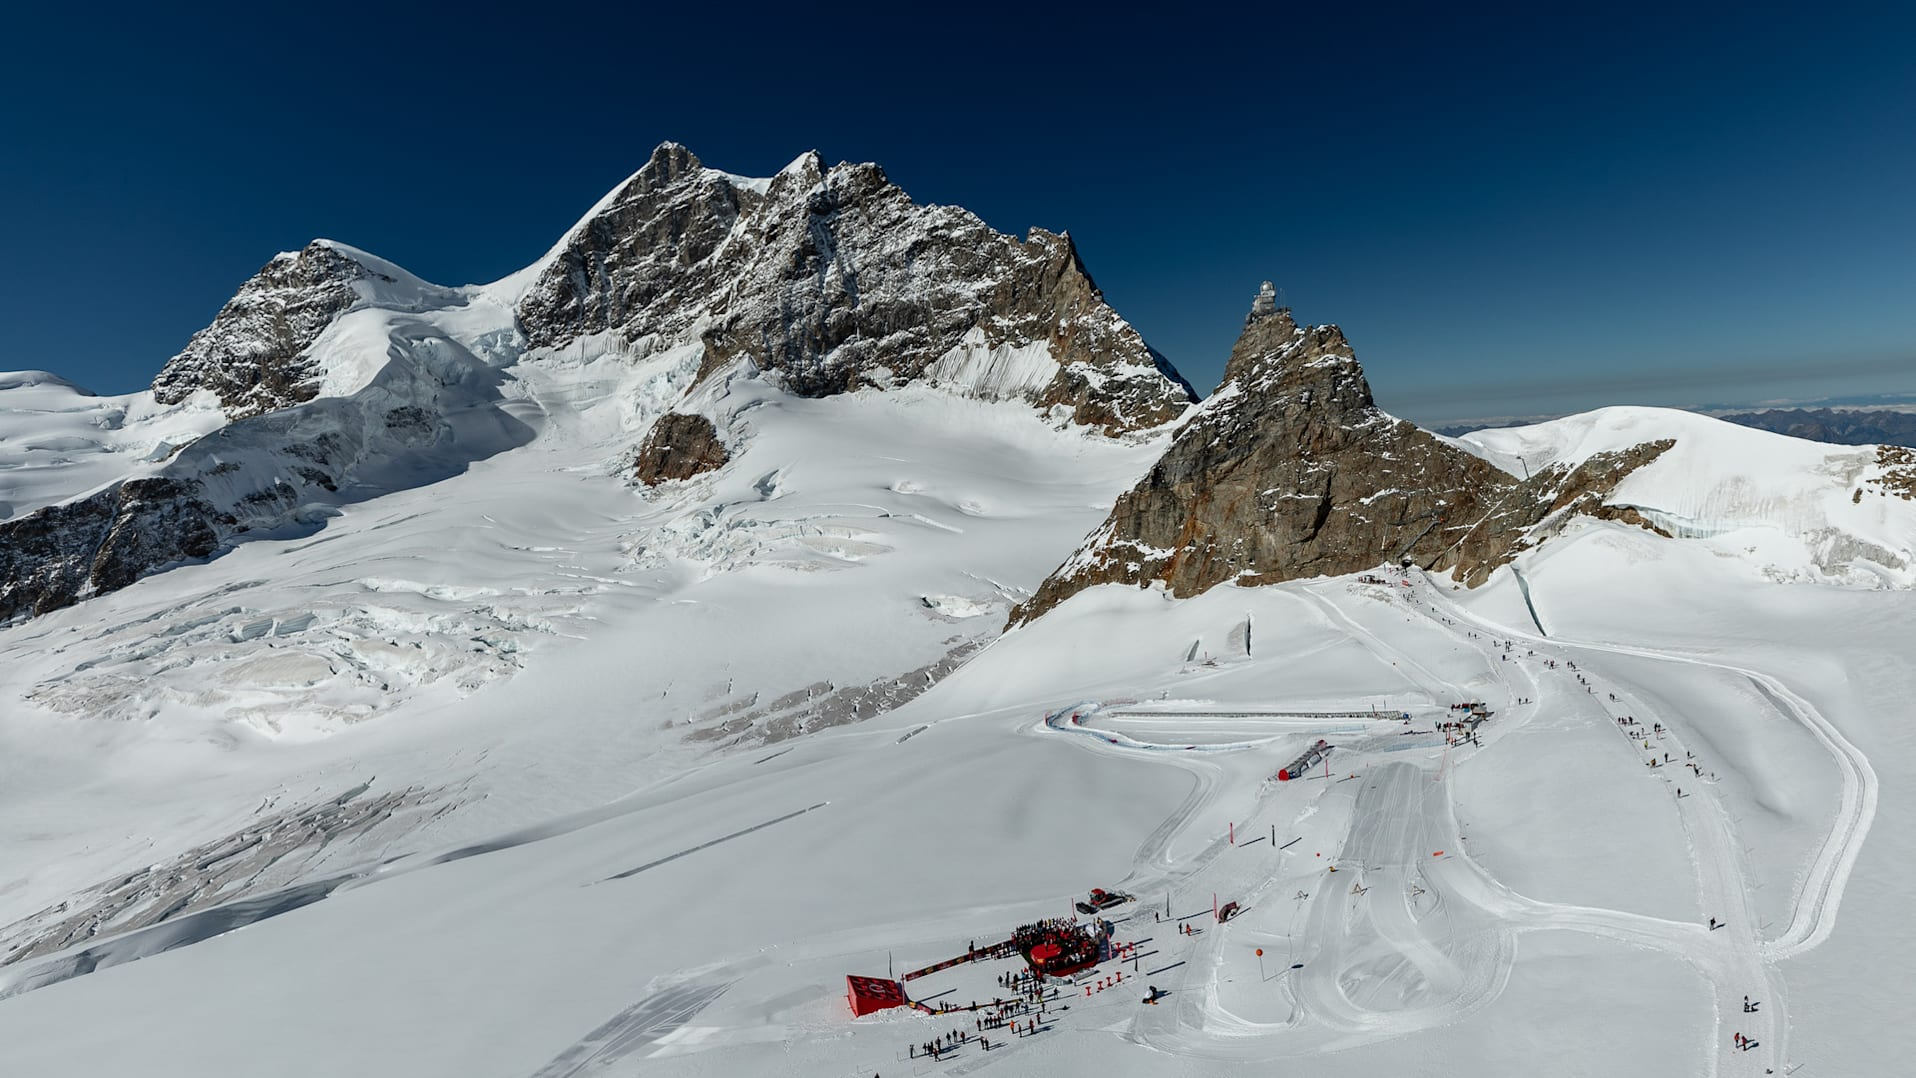 Events, Jungfraujoch-Events, Jungfraujoch-Top-of-Europe, McIlroy-Joch-2018, jungfrau.ch